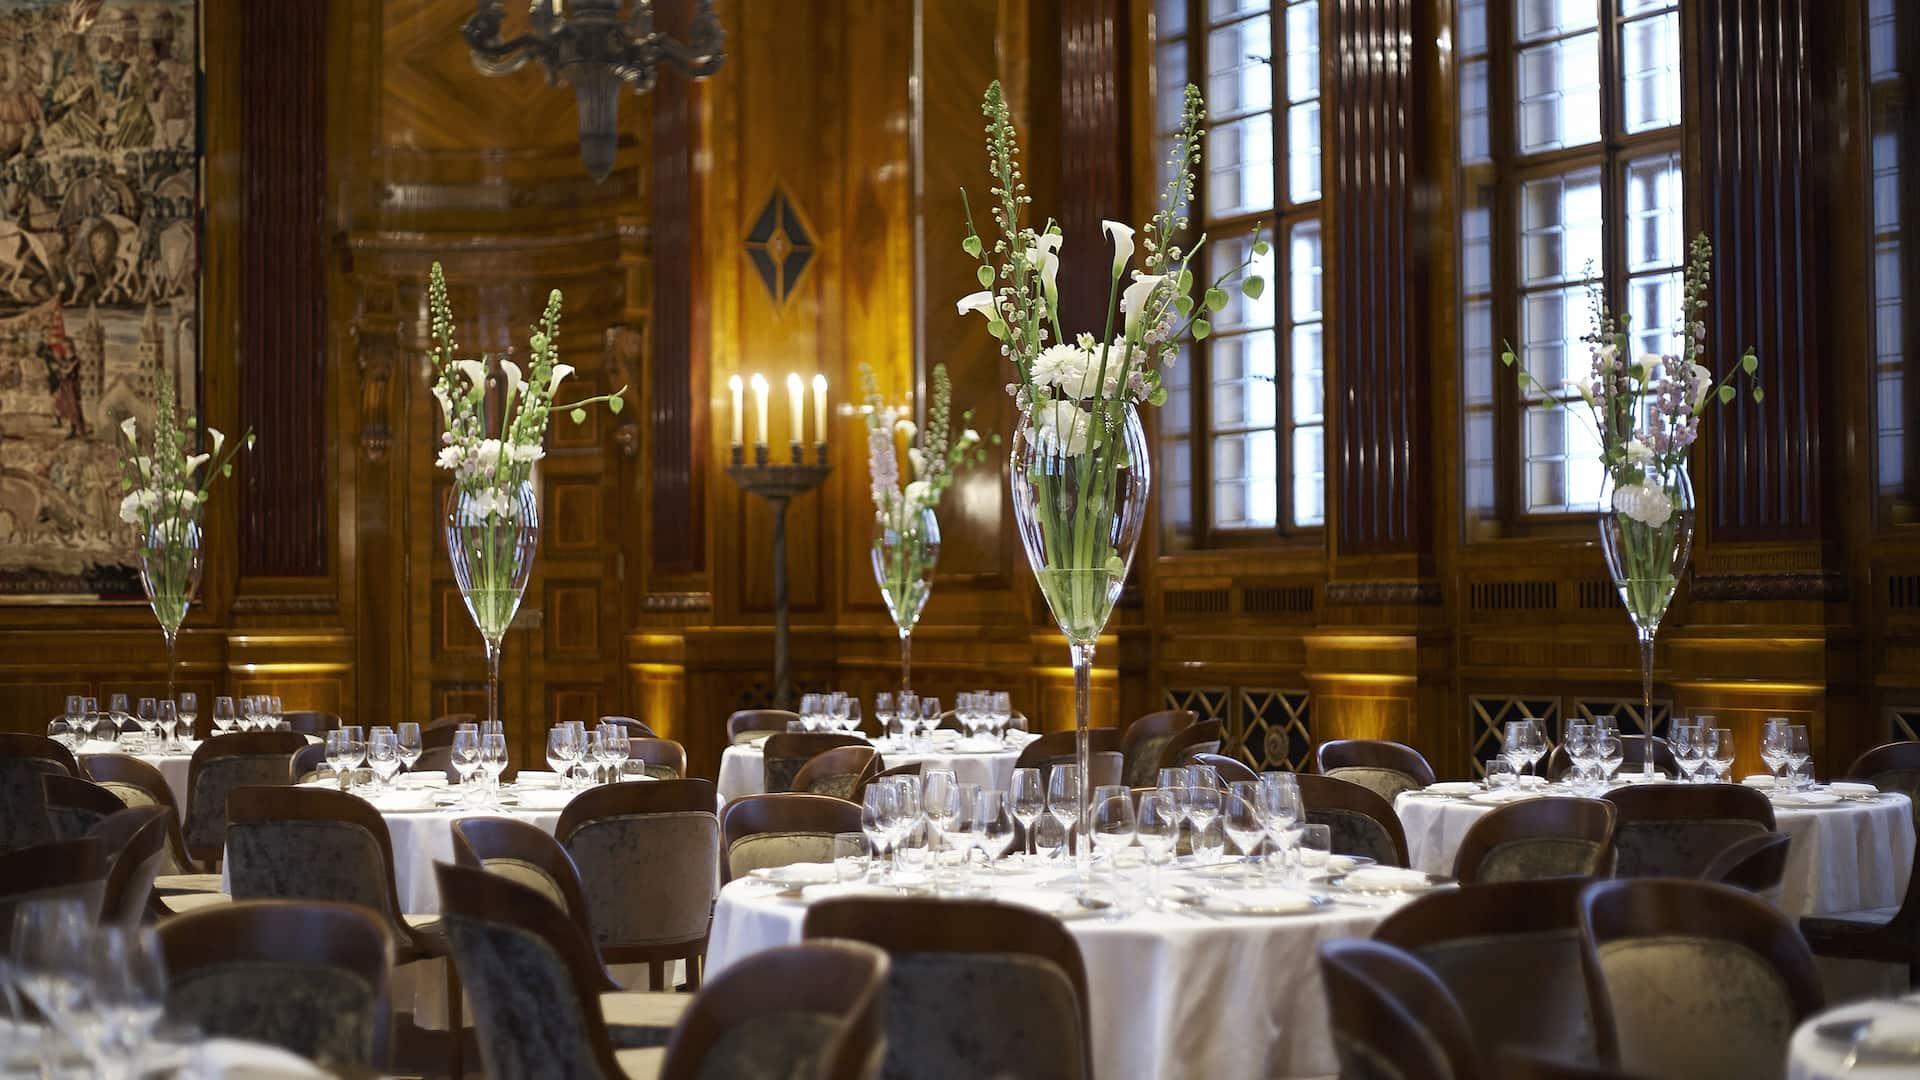 Park Hyatt Vienna Grand Salon Wedding Setup